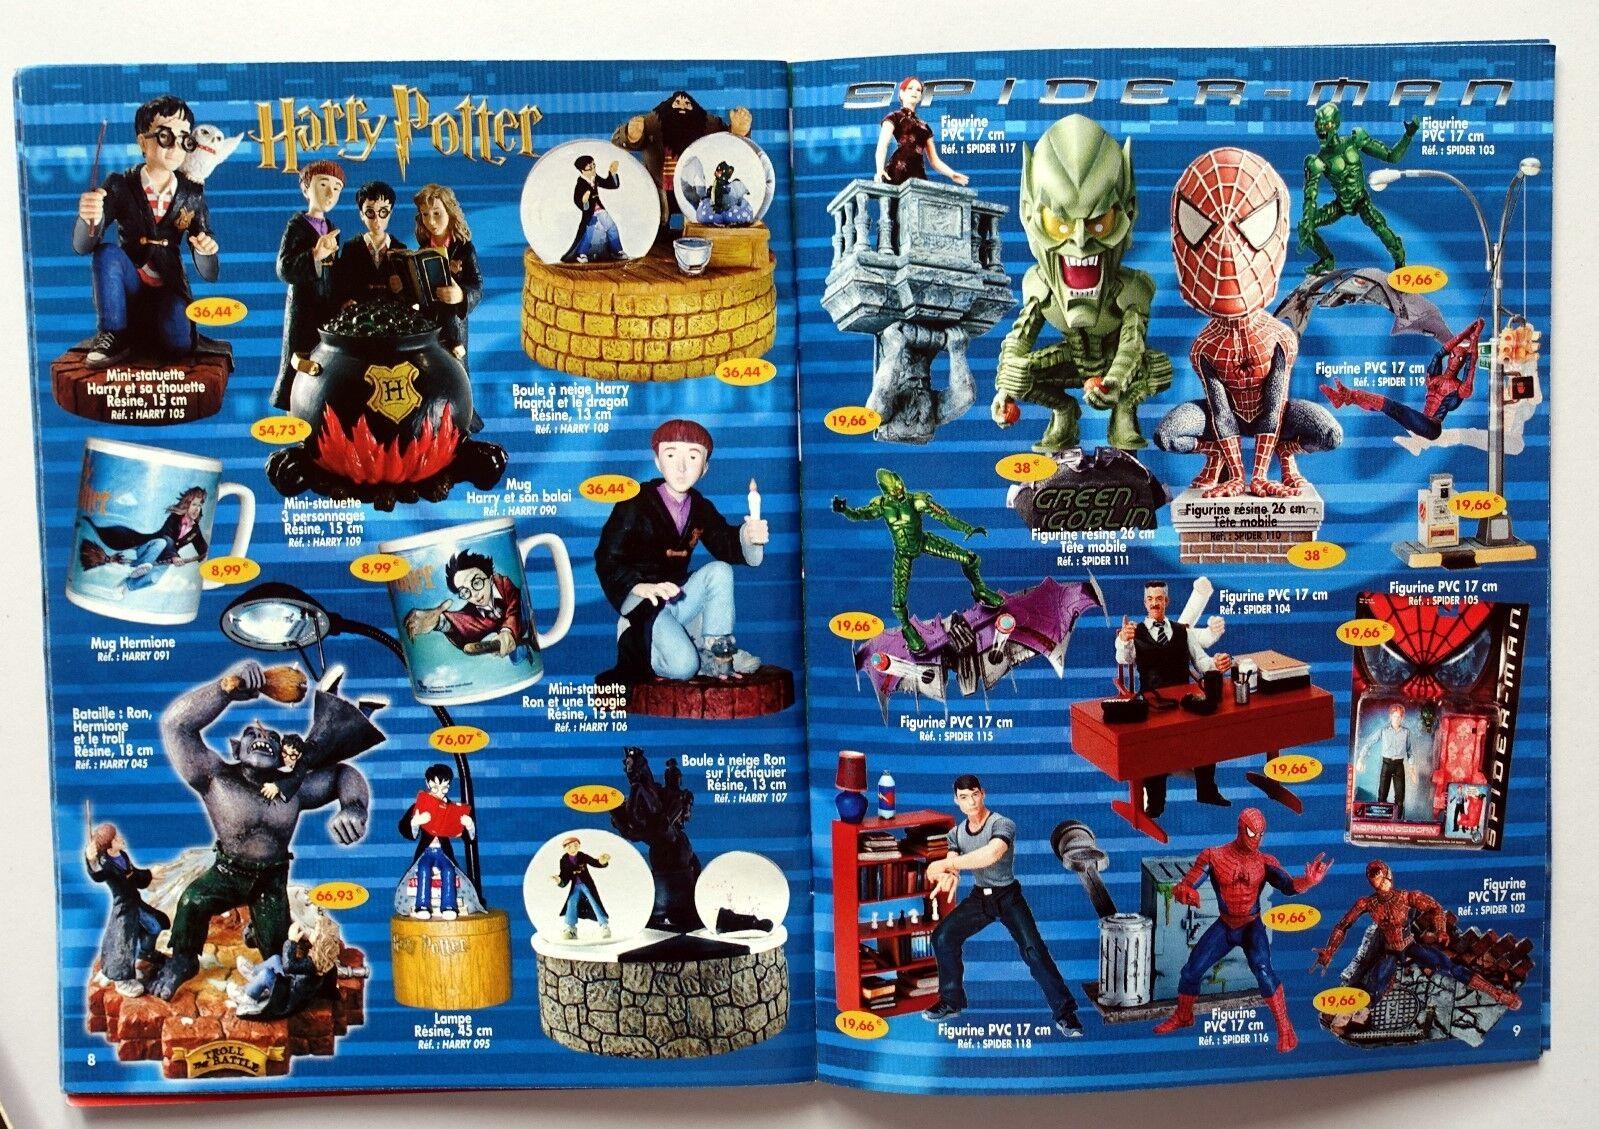 Catalogue jouets 2003 Casimir goldorak Shrek Harry Potter Spider-man Lord rings